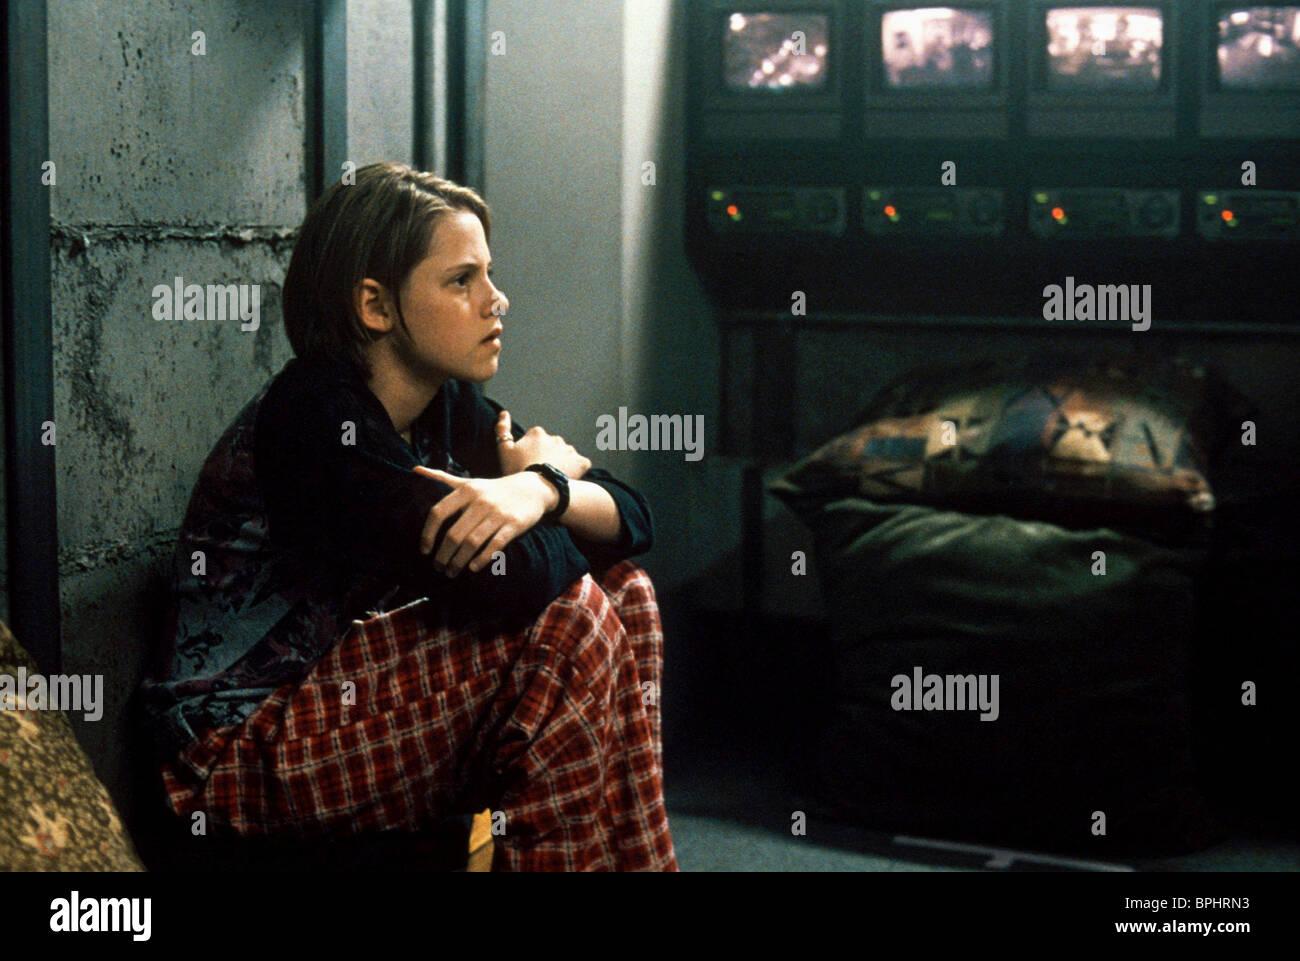 Kristen Stewart Panic Room 2002 Stock Photo Alamy